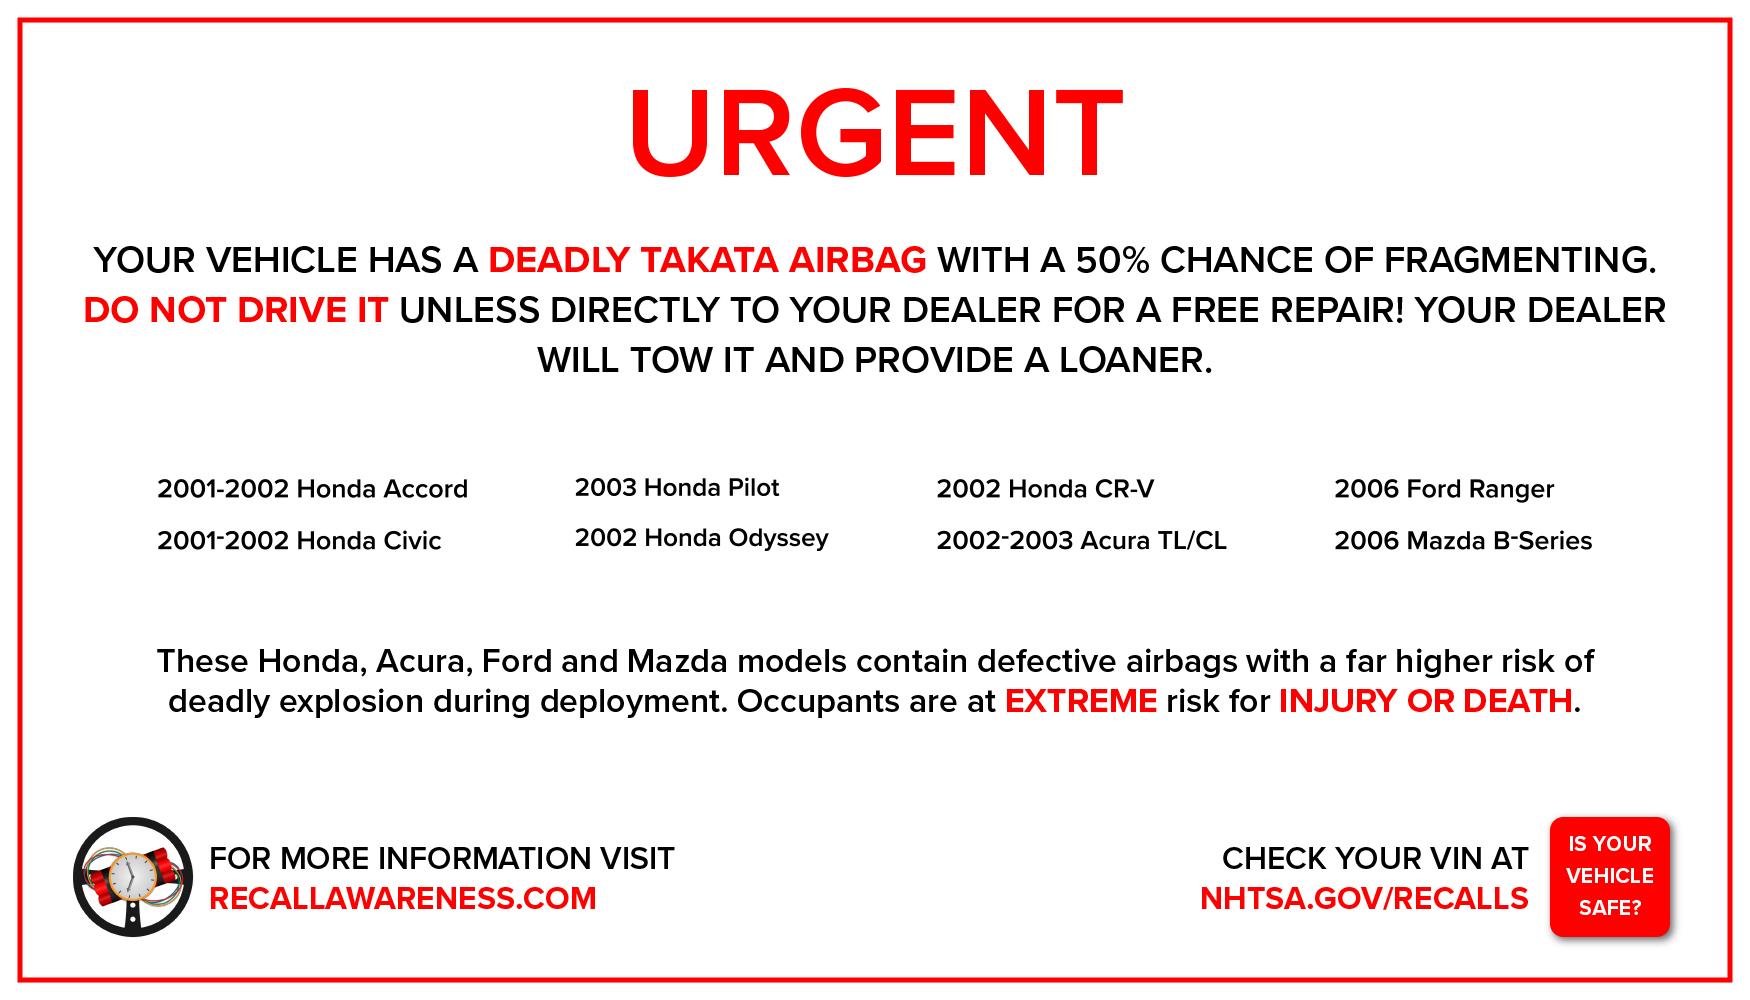 Takata Airbag Recall Awareness